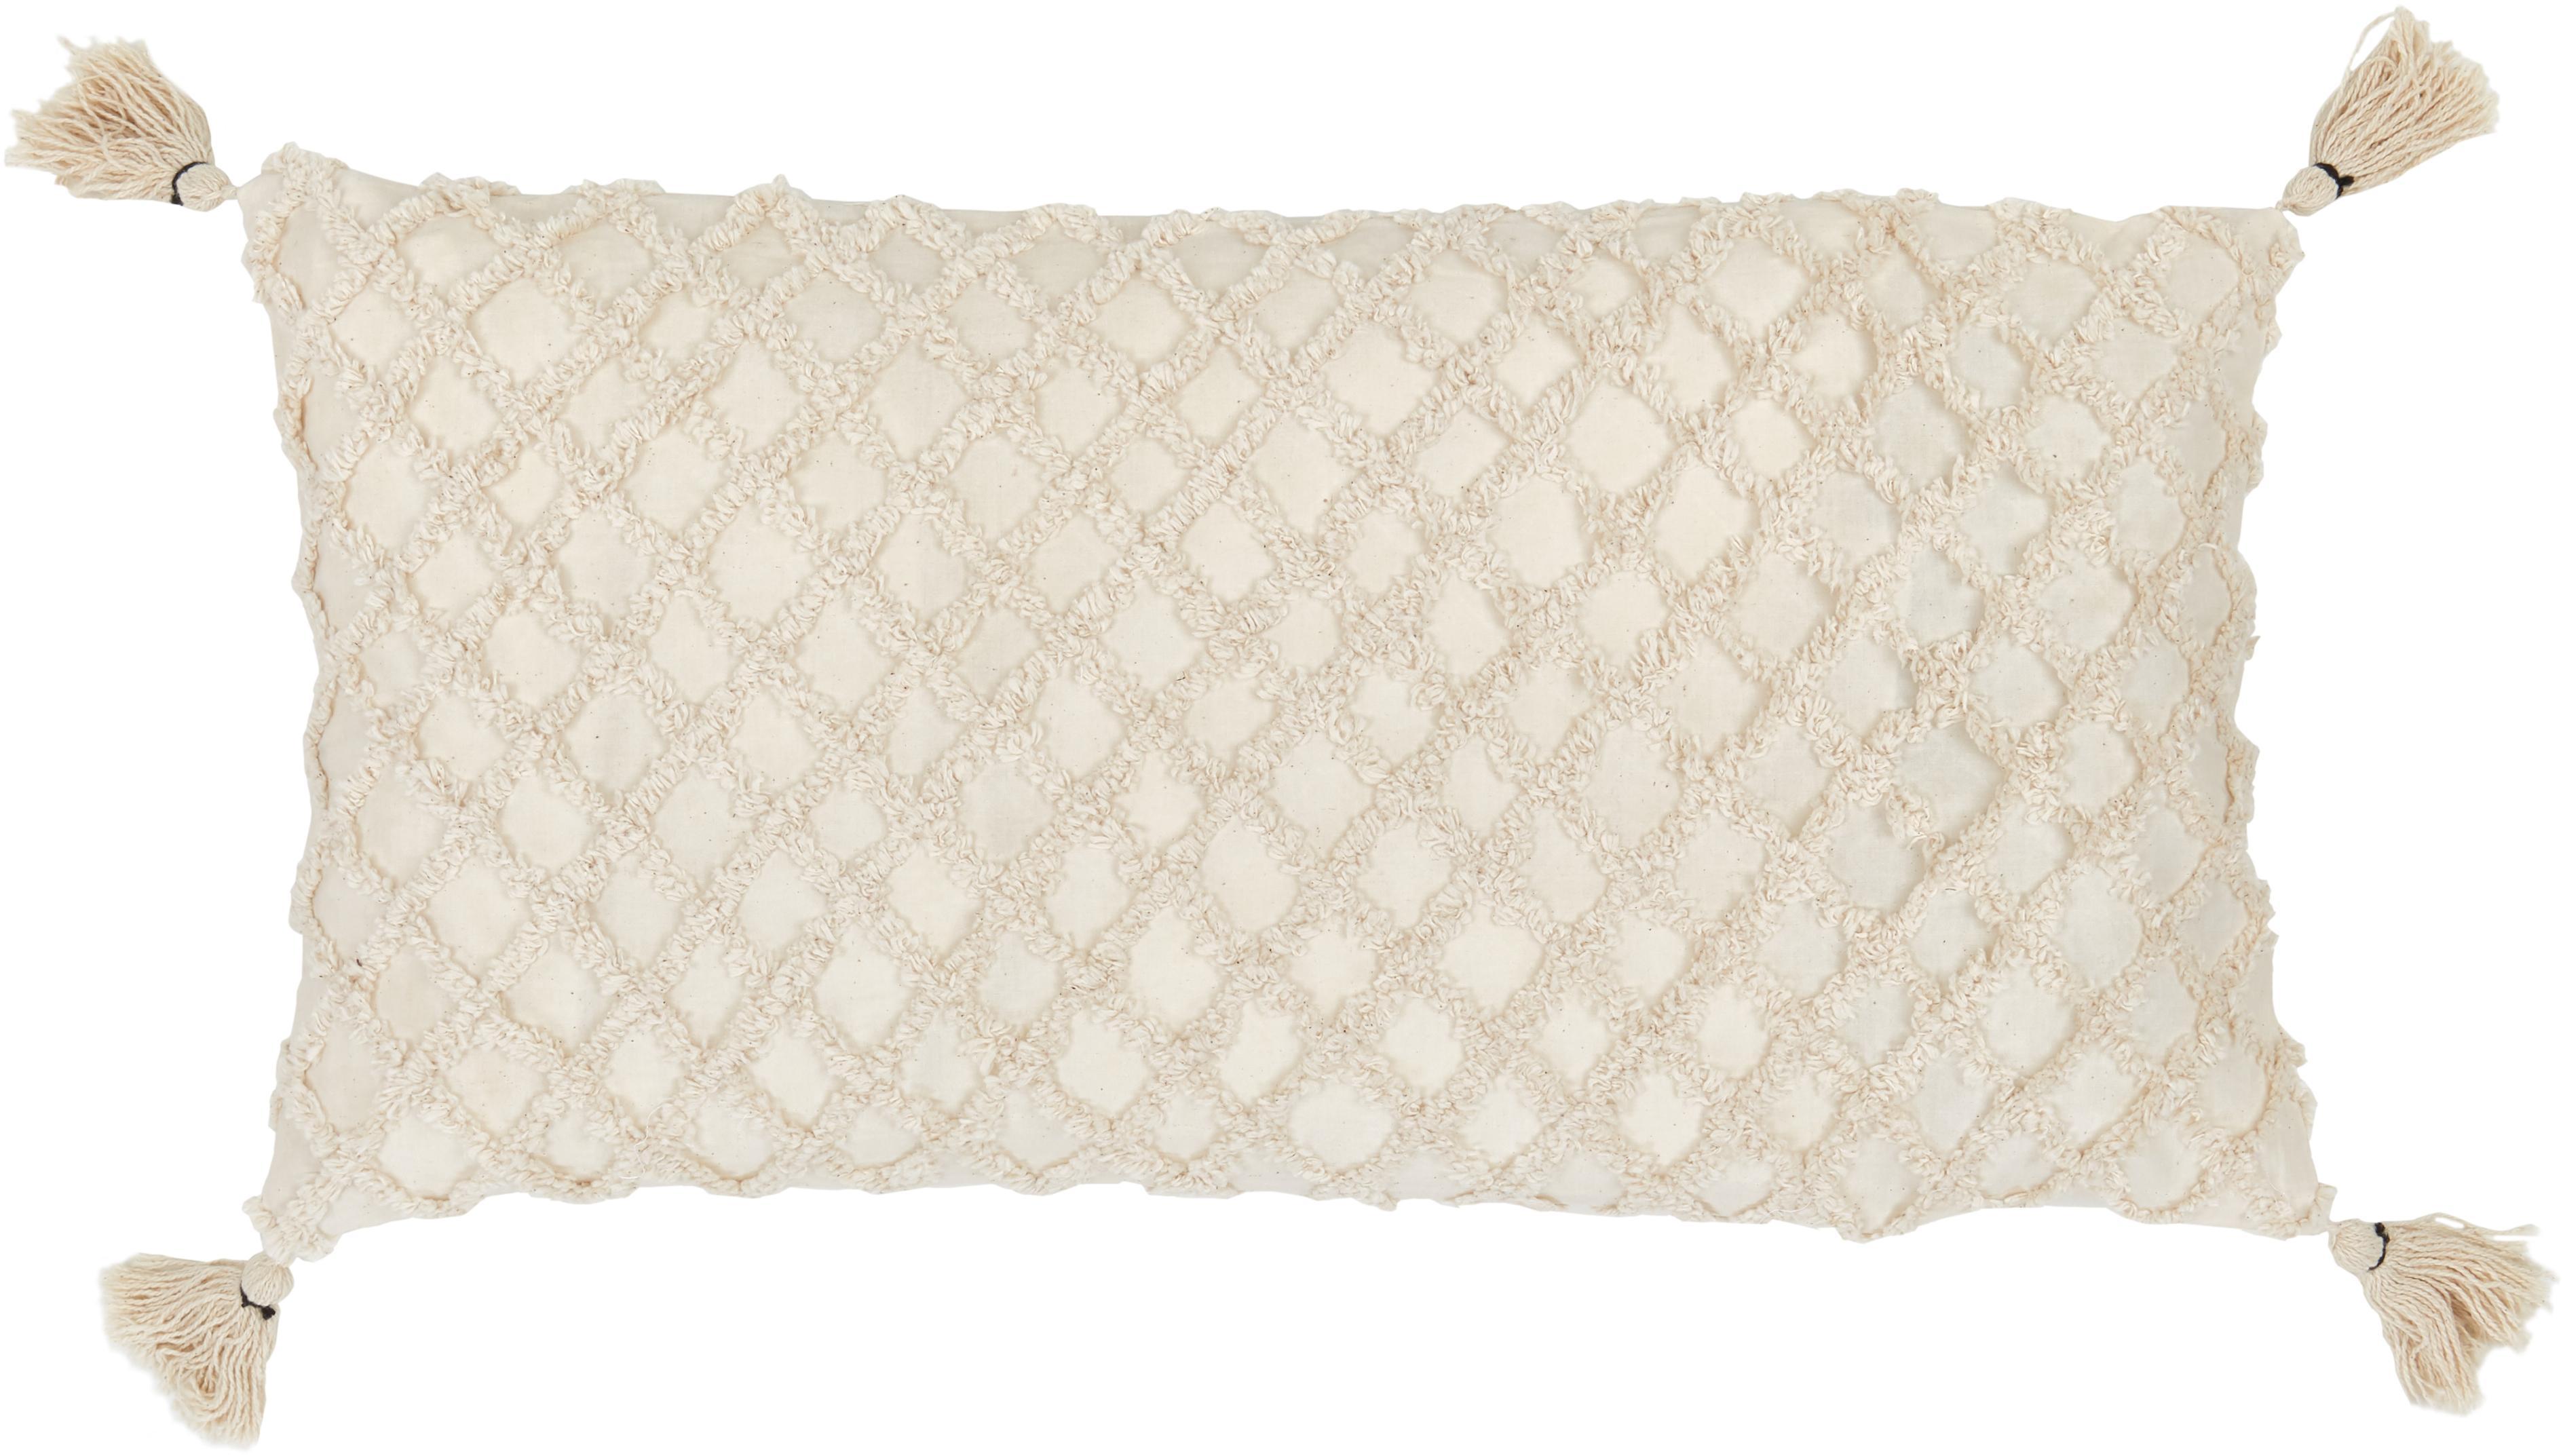 Funda de cojín texturizada Royal, Algodón, Blanco crudo, An 30 x L 60 cm